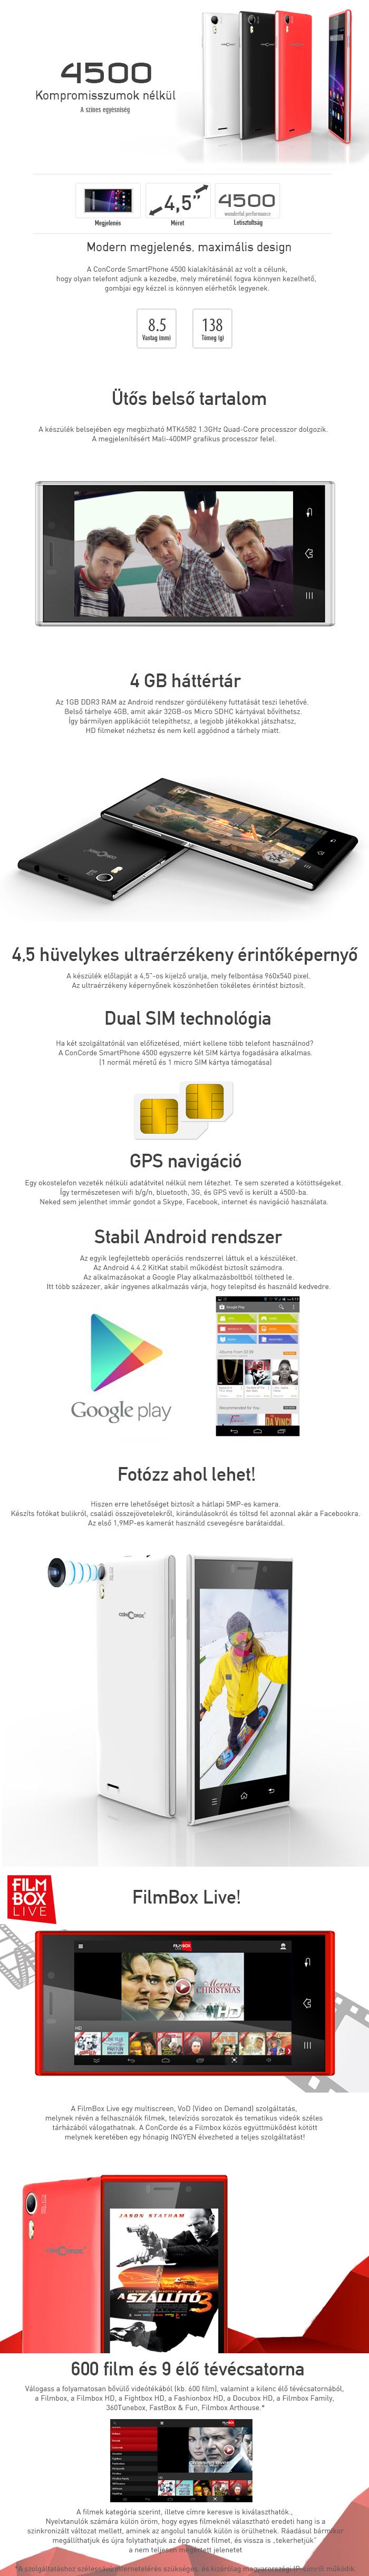 ConCorde_SmartPhone_4500_bemutato.jpg